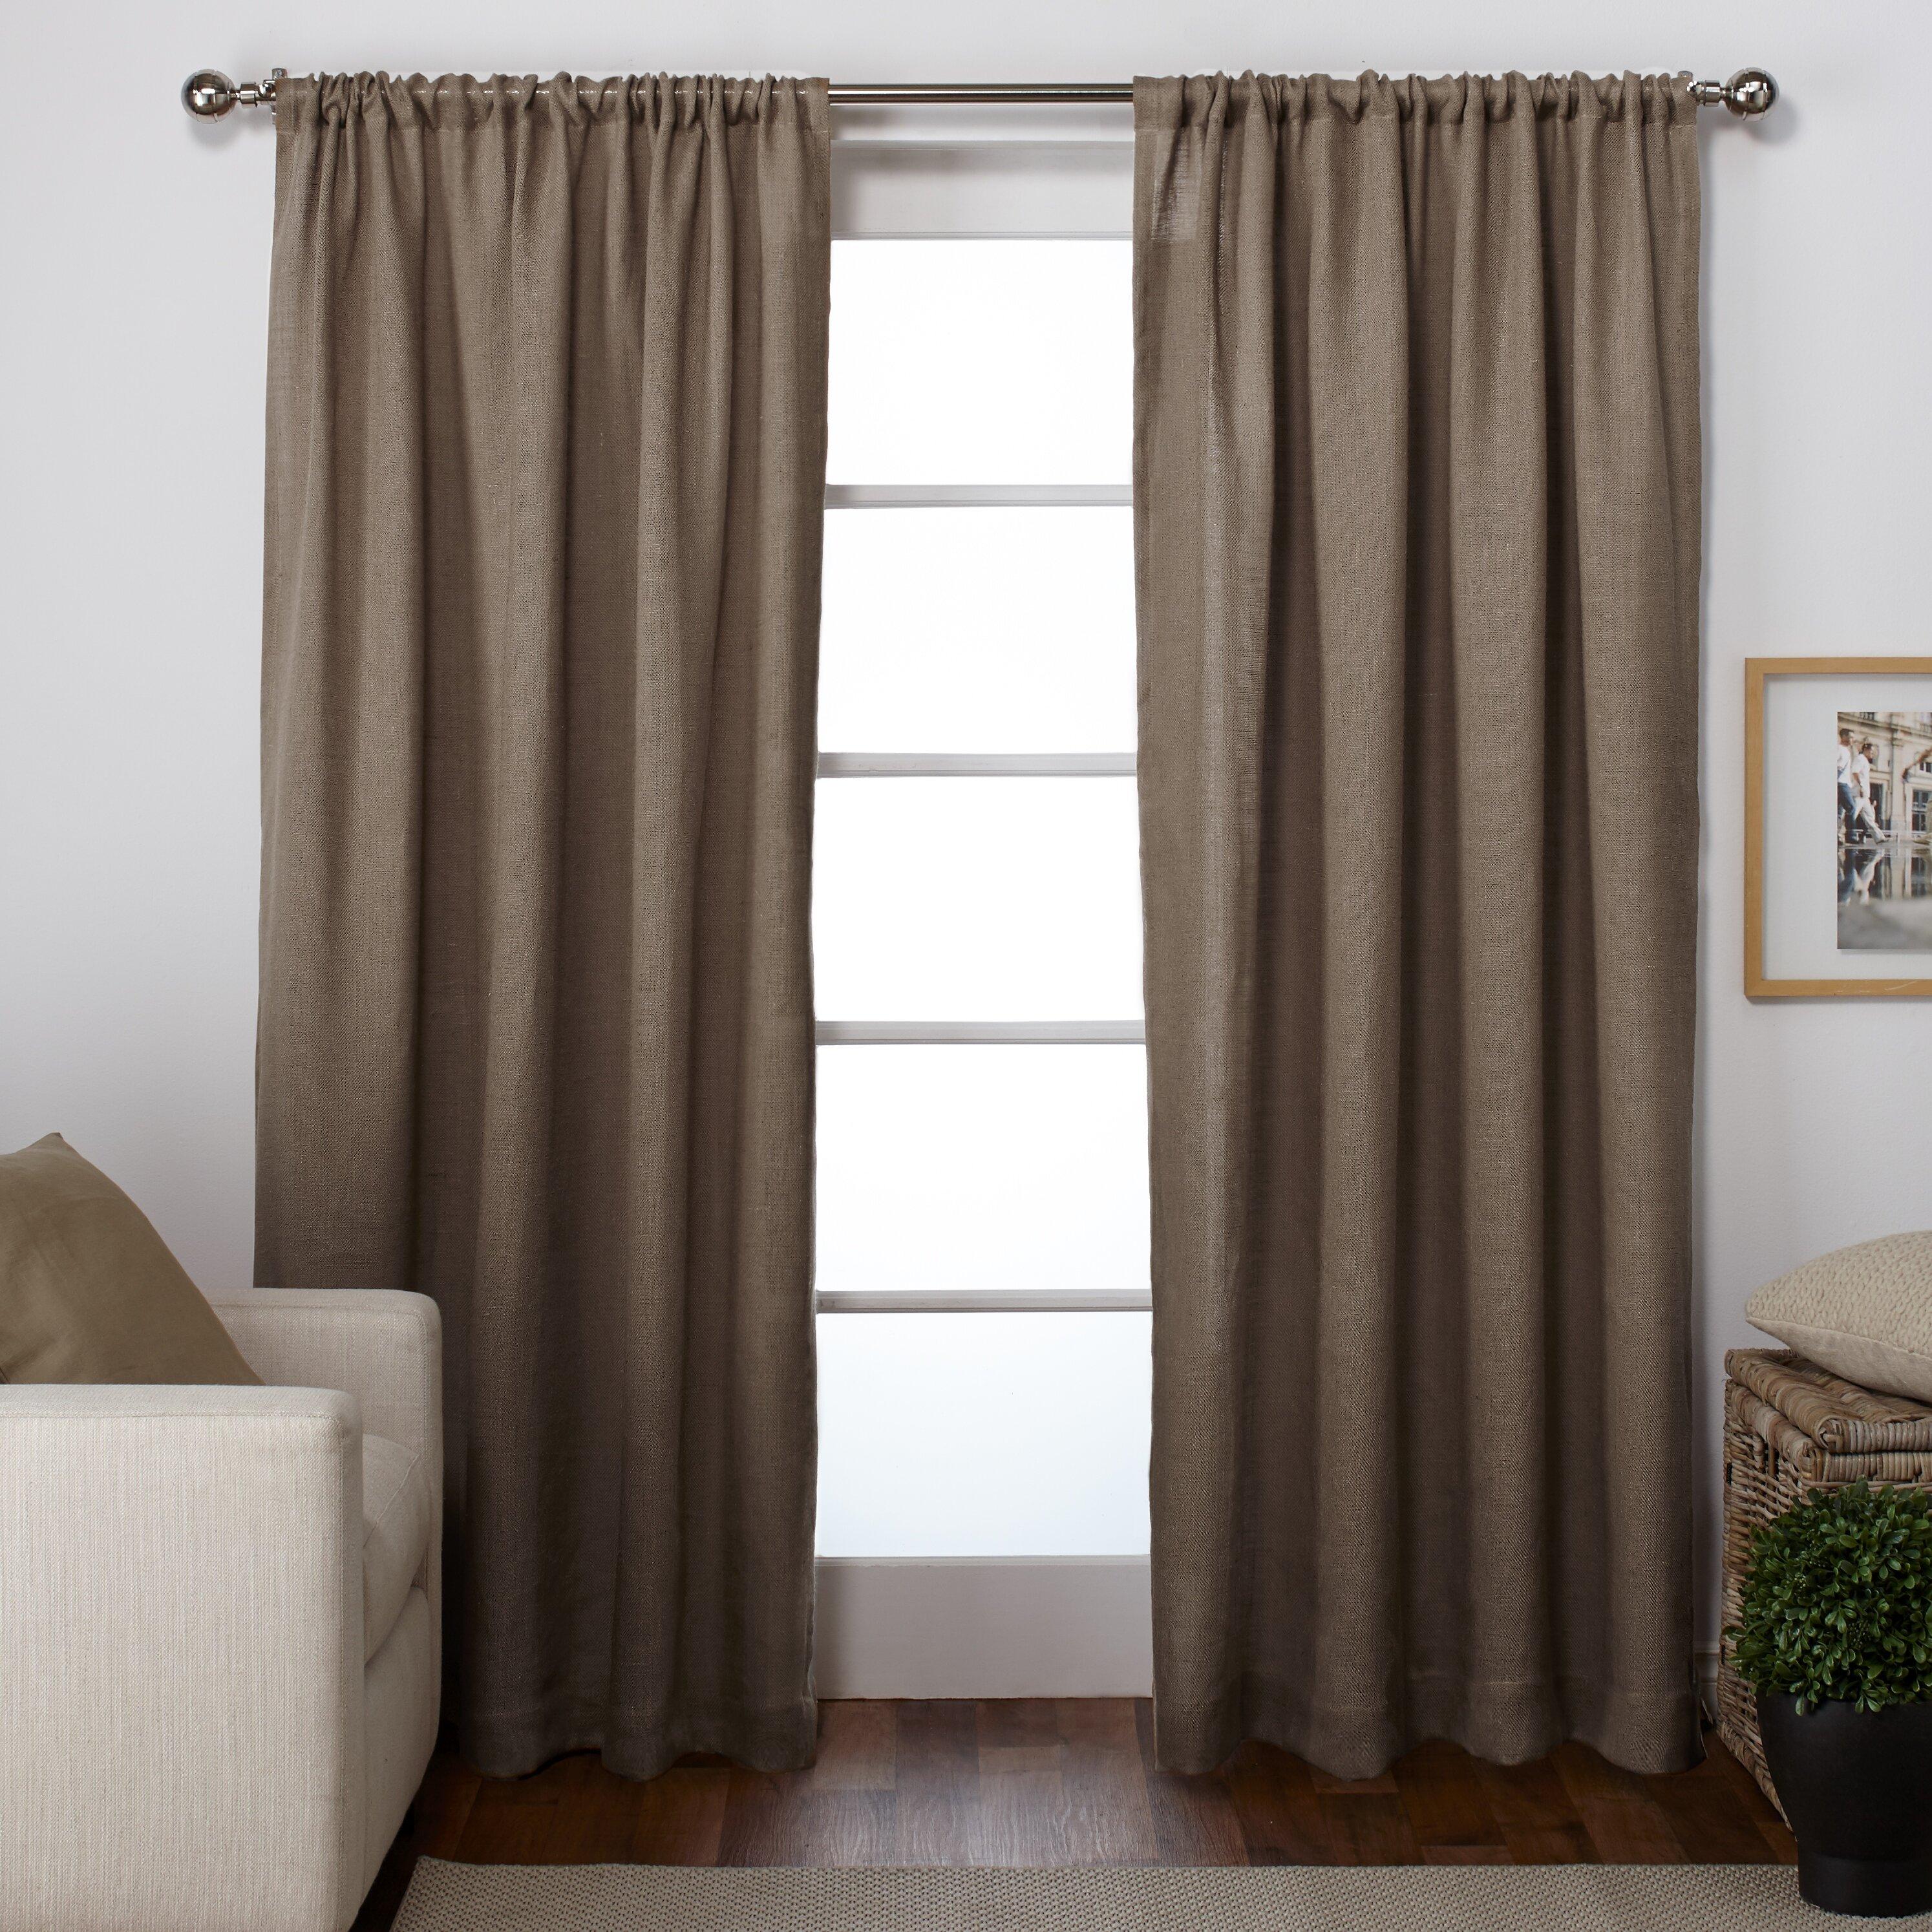 Amalgamated textiles burlap curtain panel reviews wayfair for Burlap christmas curtains